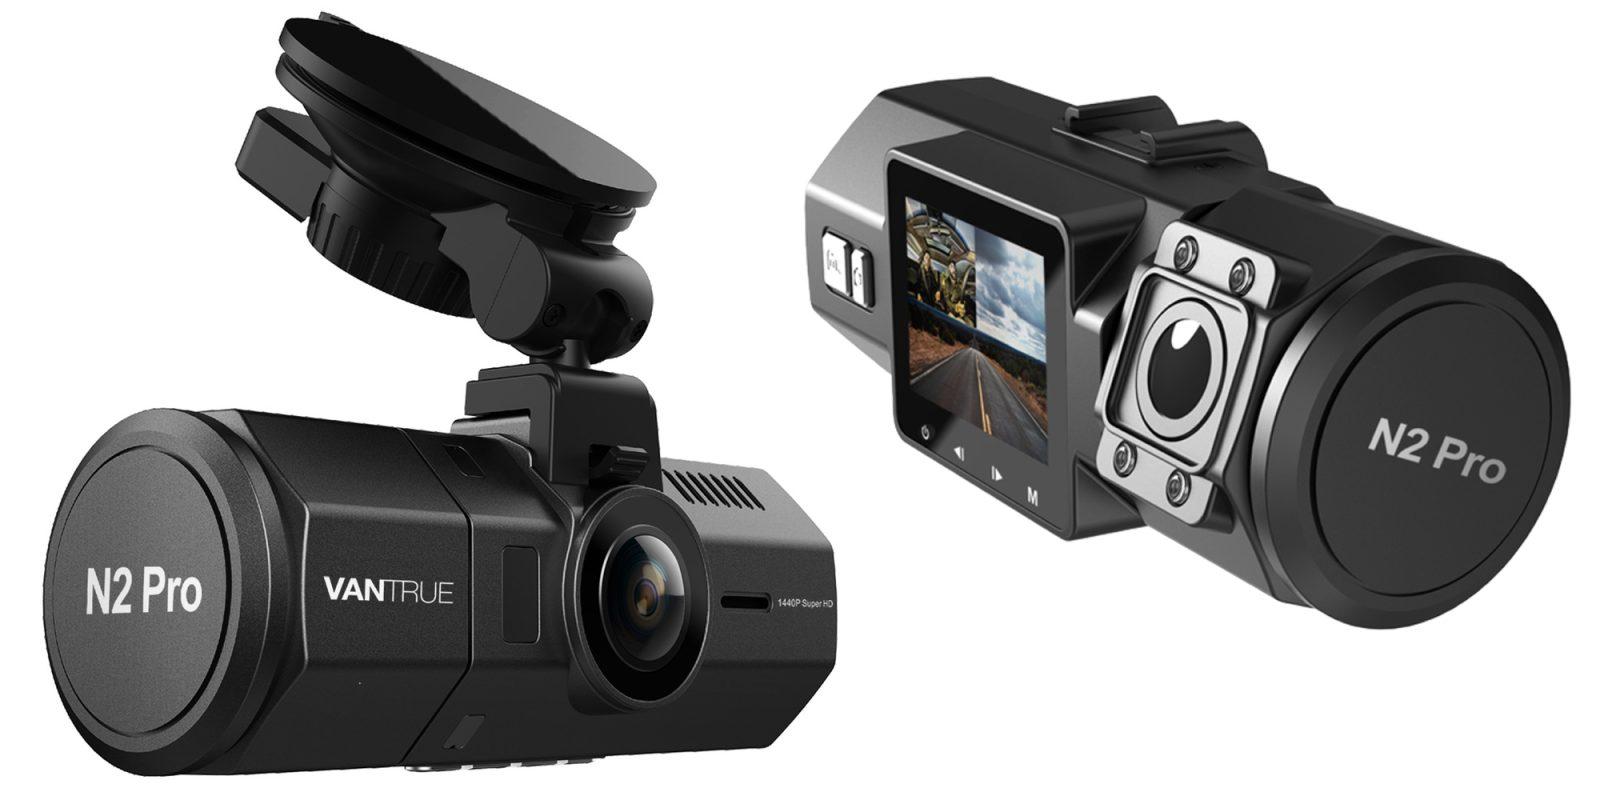 vantrue 39 s n2 pro 1080p dash cam has dual sensors now down. Black Bedroom Furniture Sets. Home Design Ideas